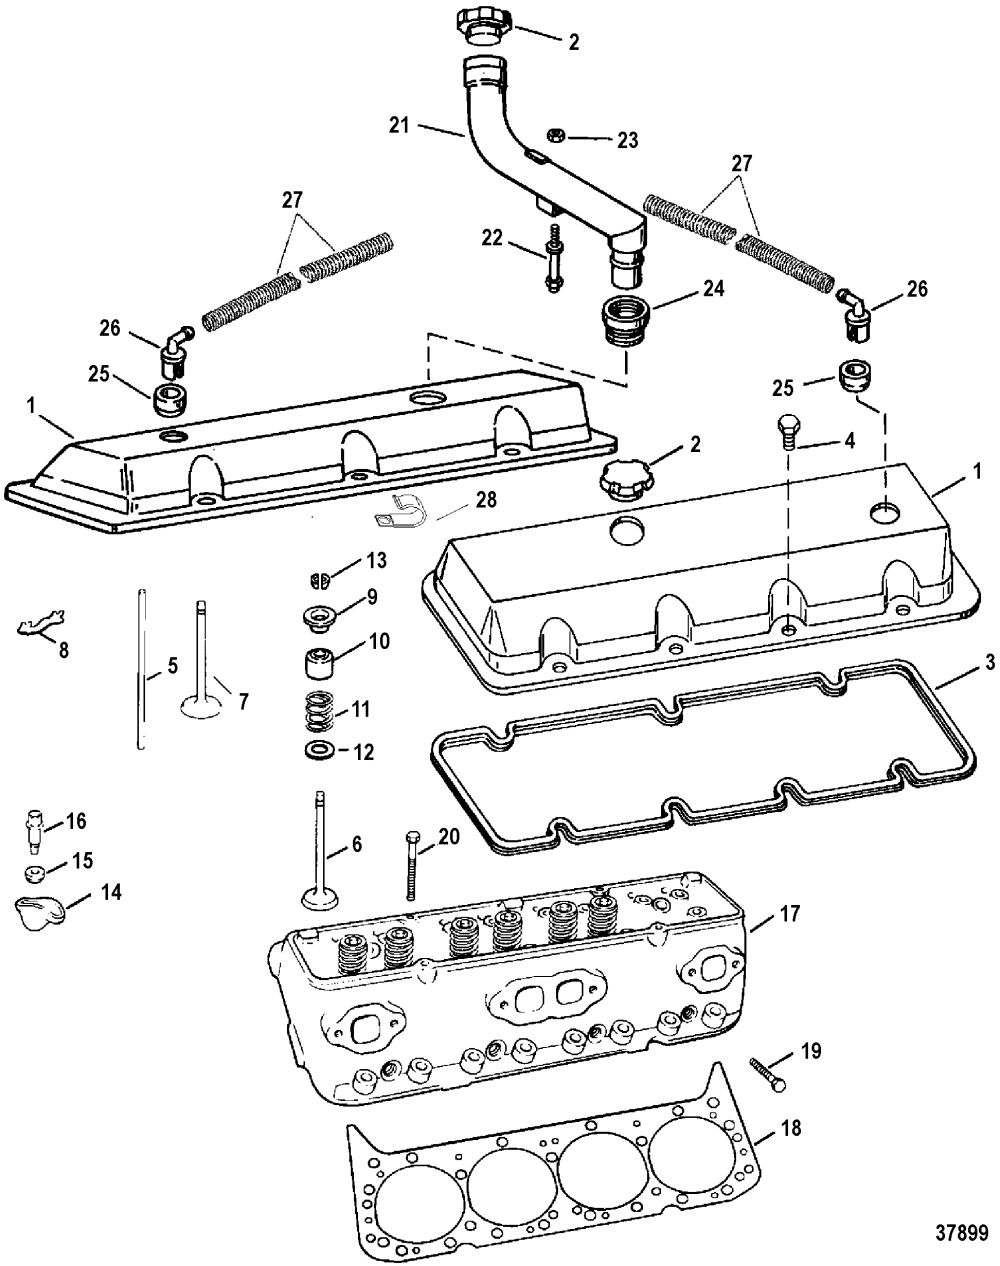 medium resolution of 454 engine parts diagram wiring diagram detailed chevy 454 vacuum diagram chevy 454 rv engine diagram